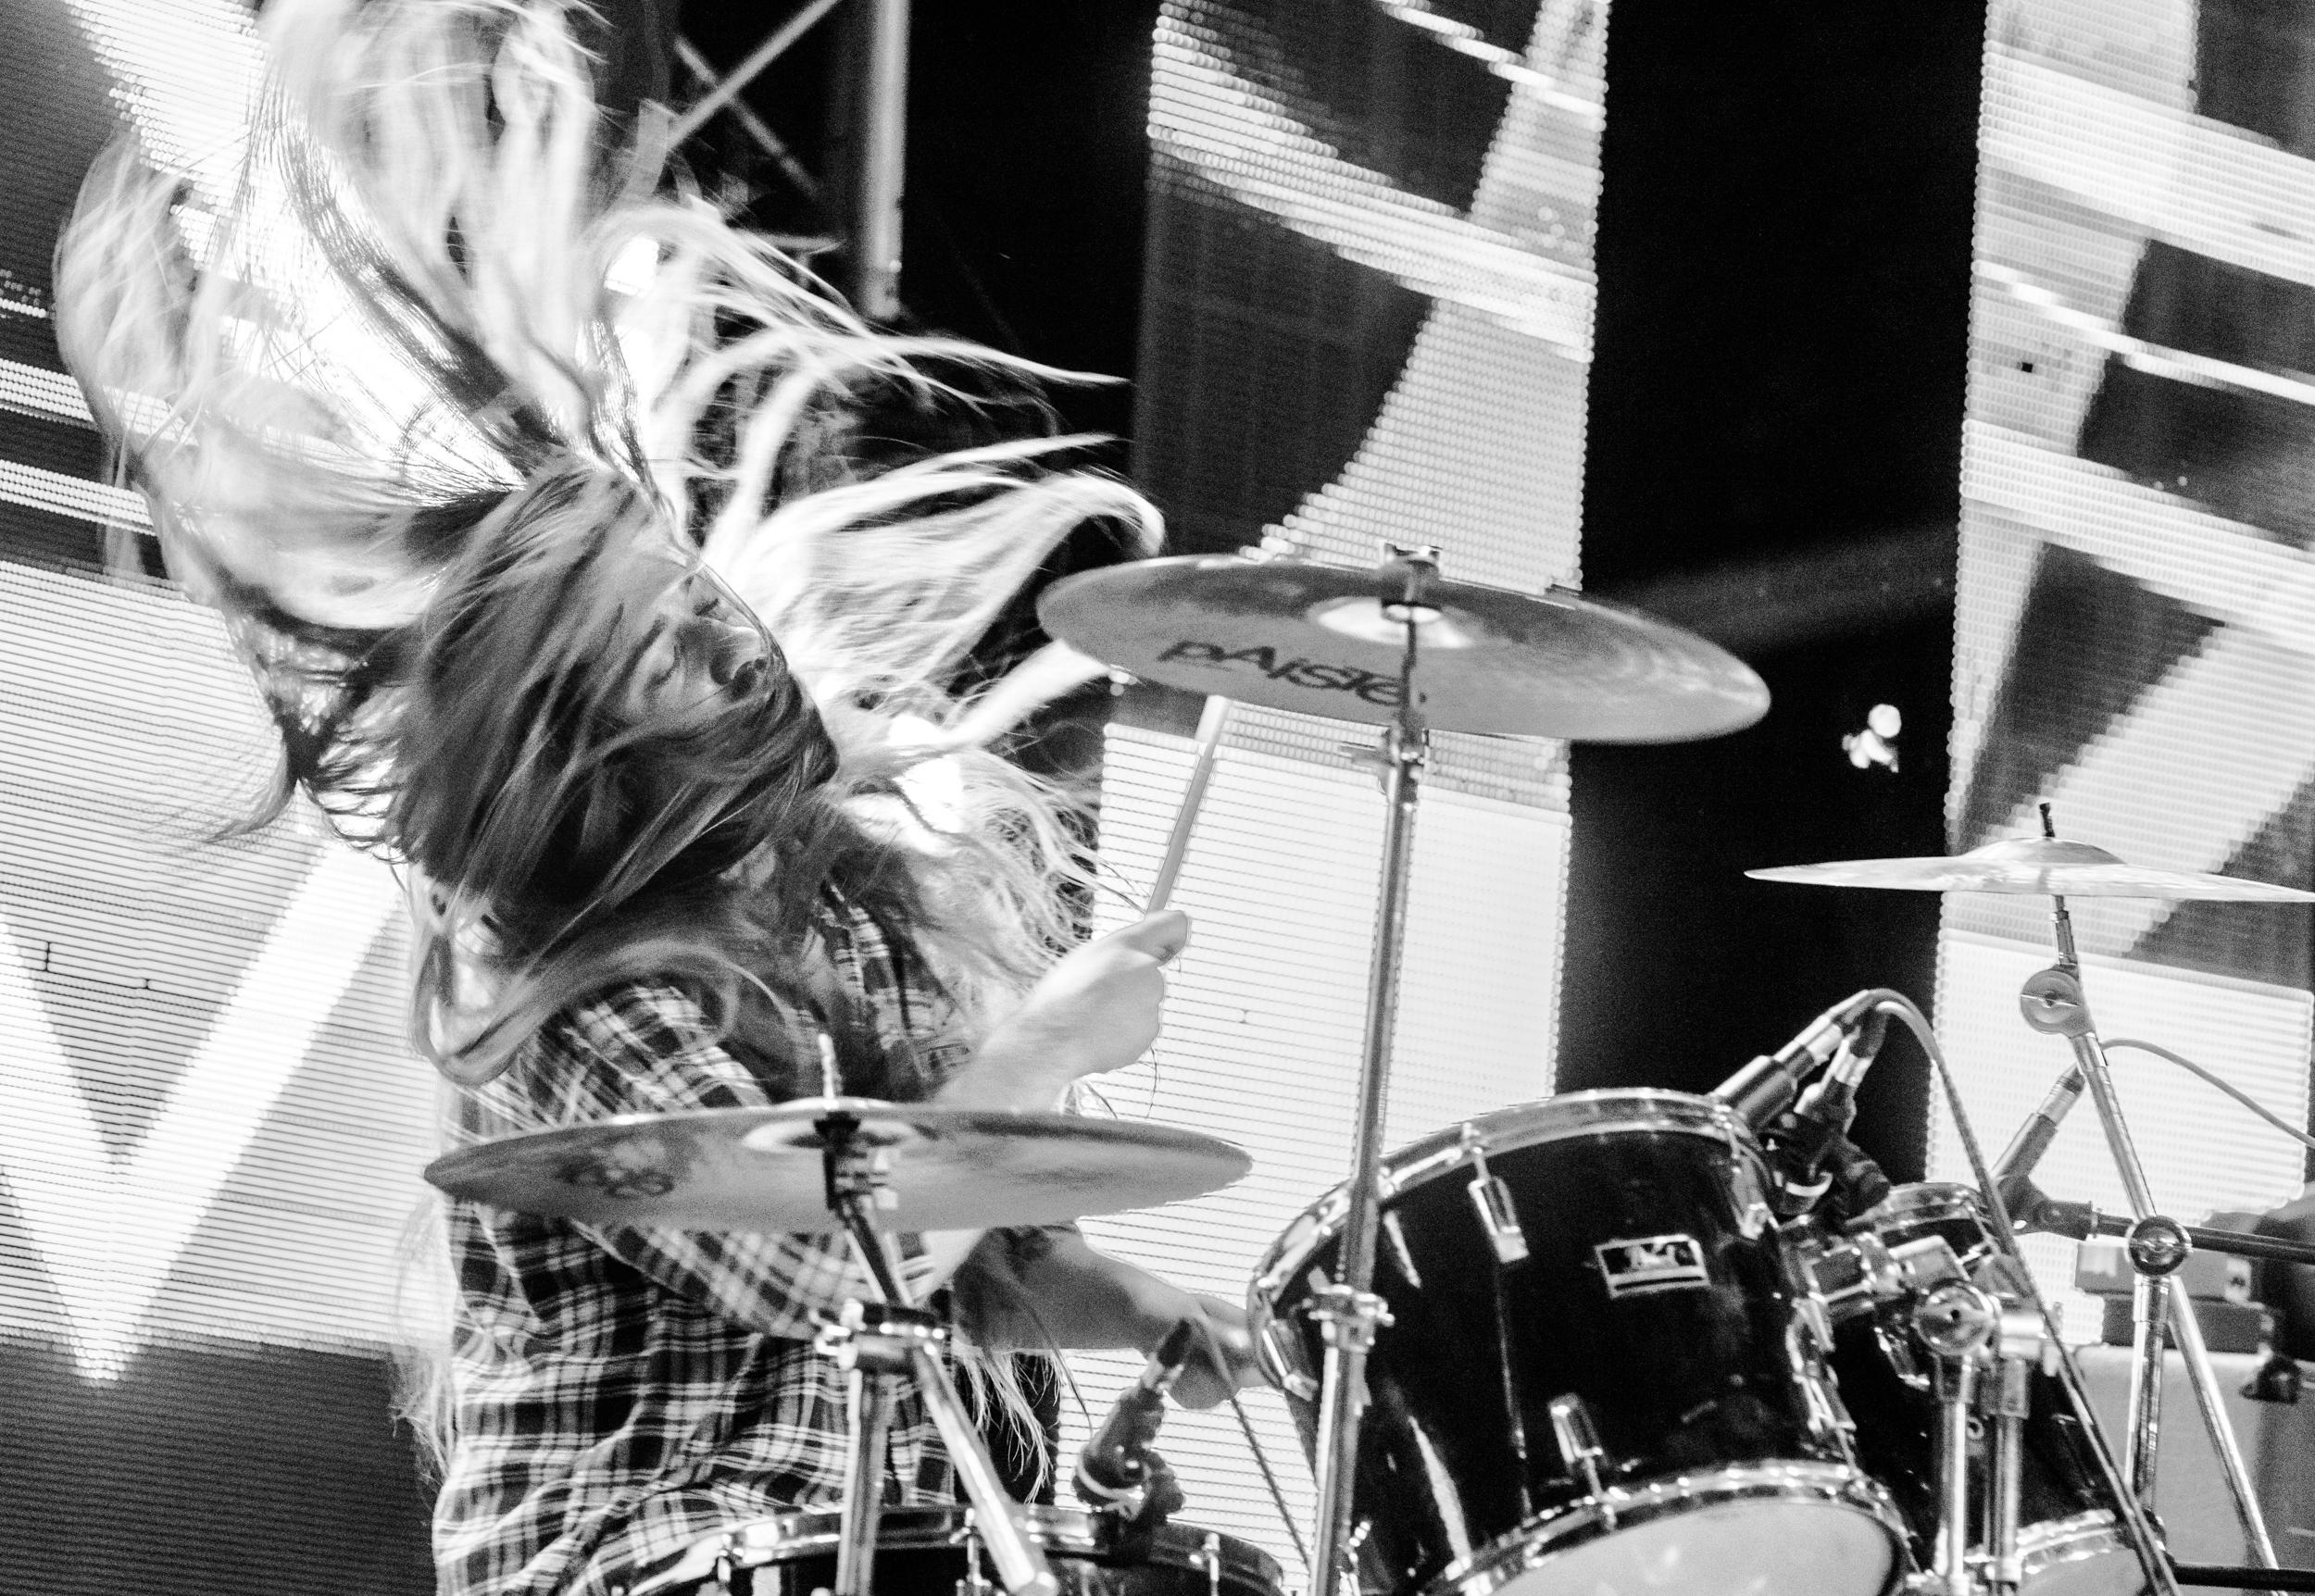 Beating Drum is a heart – Postavka rok fotografija Nemanje Đorđevića